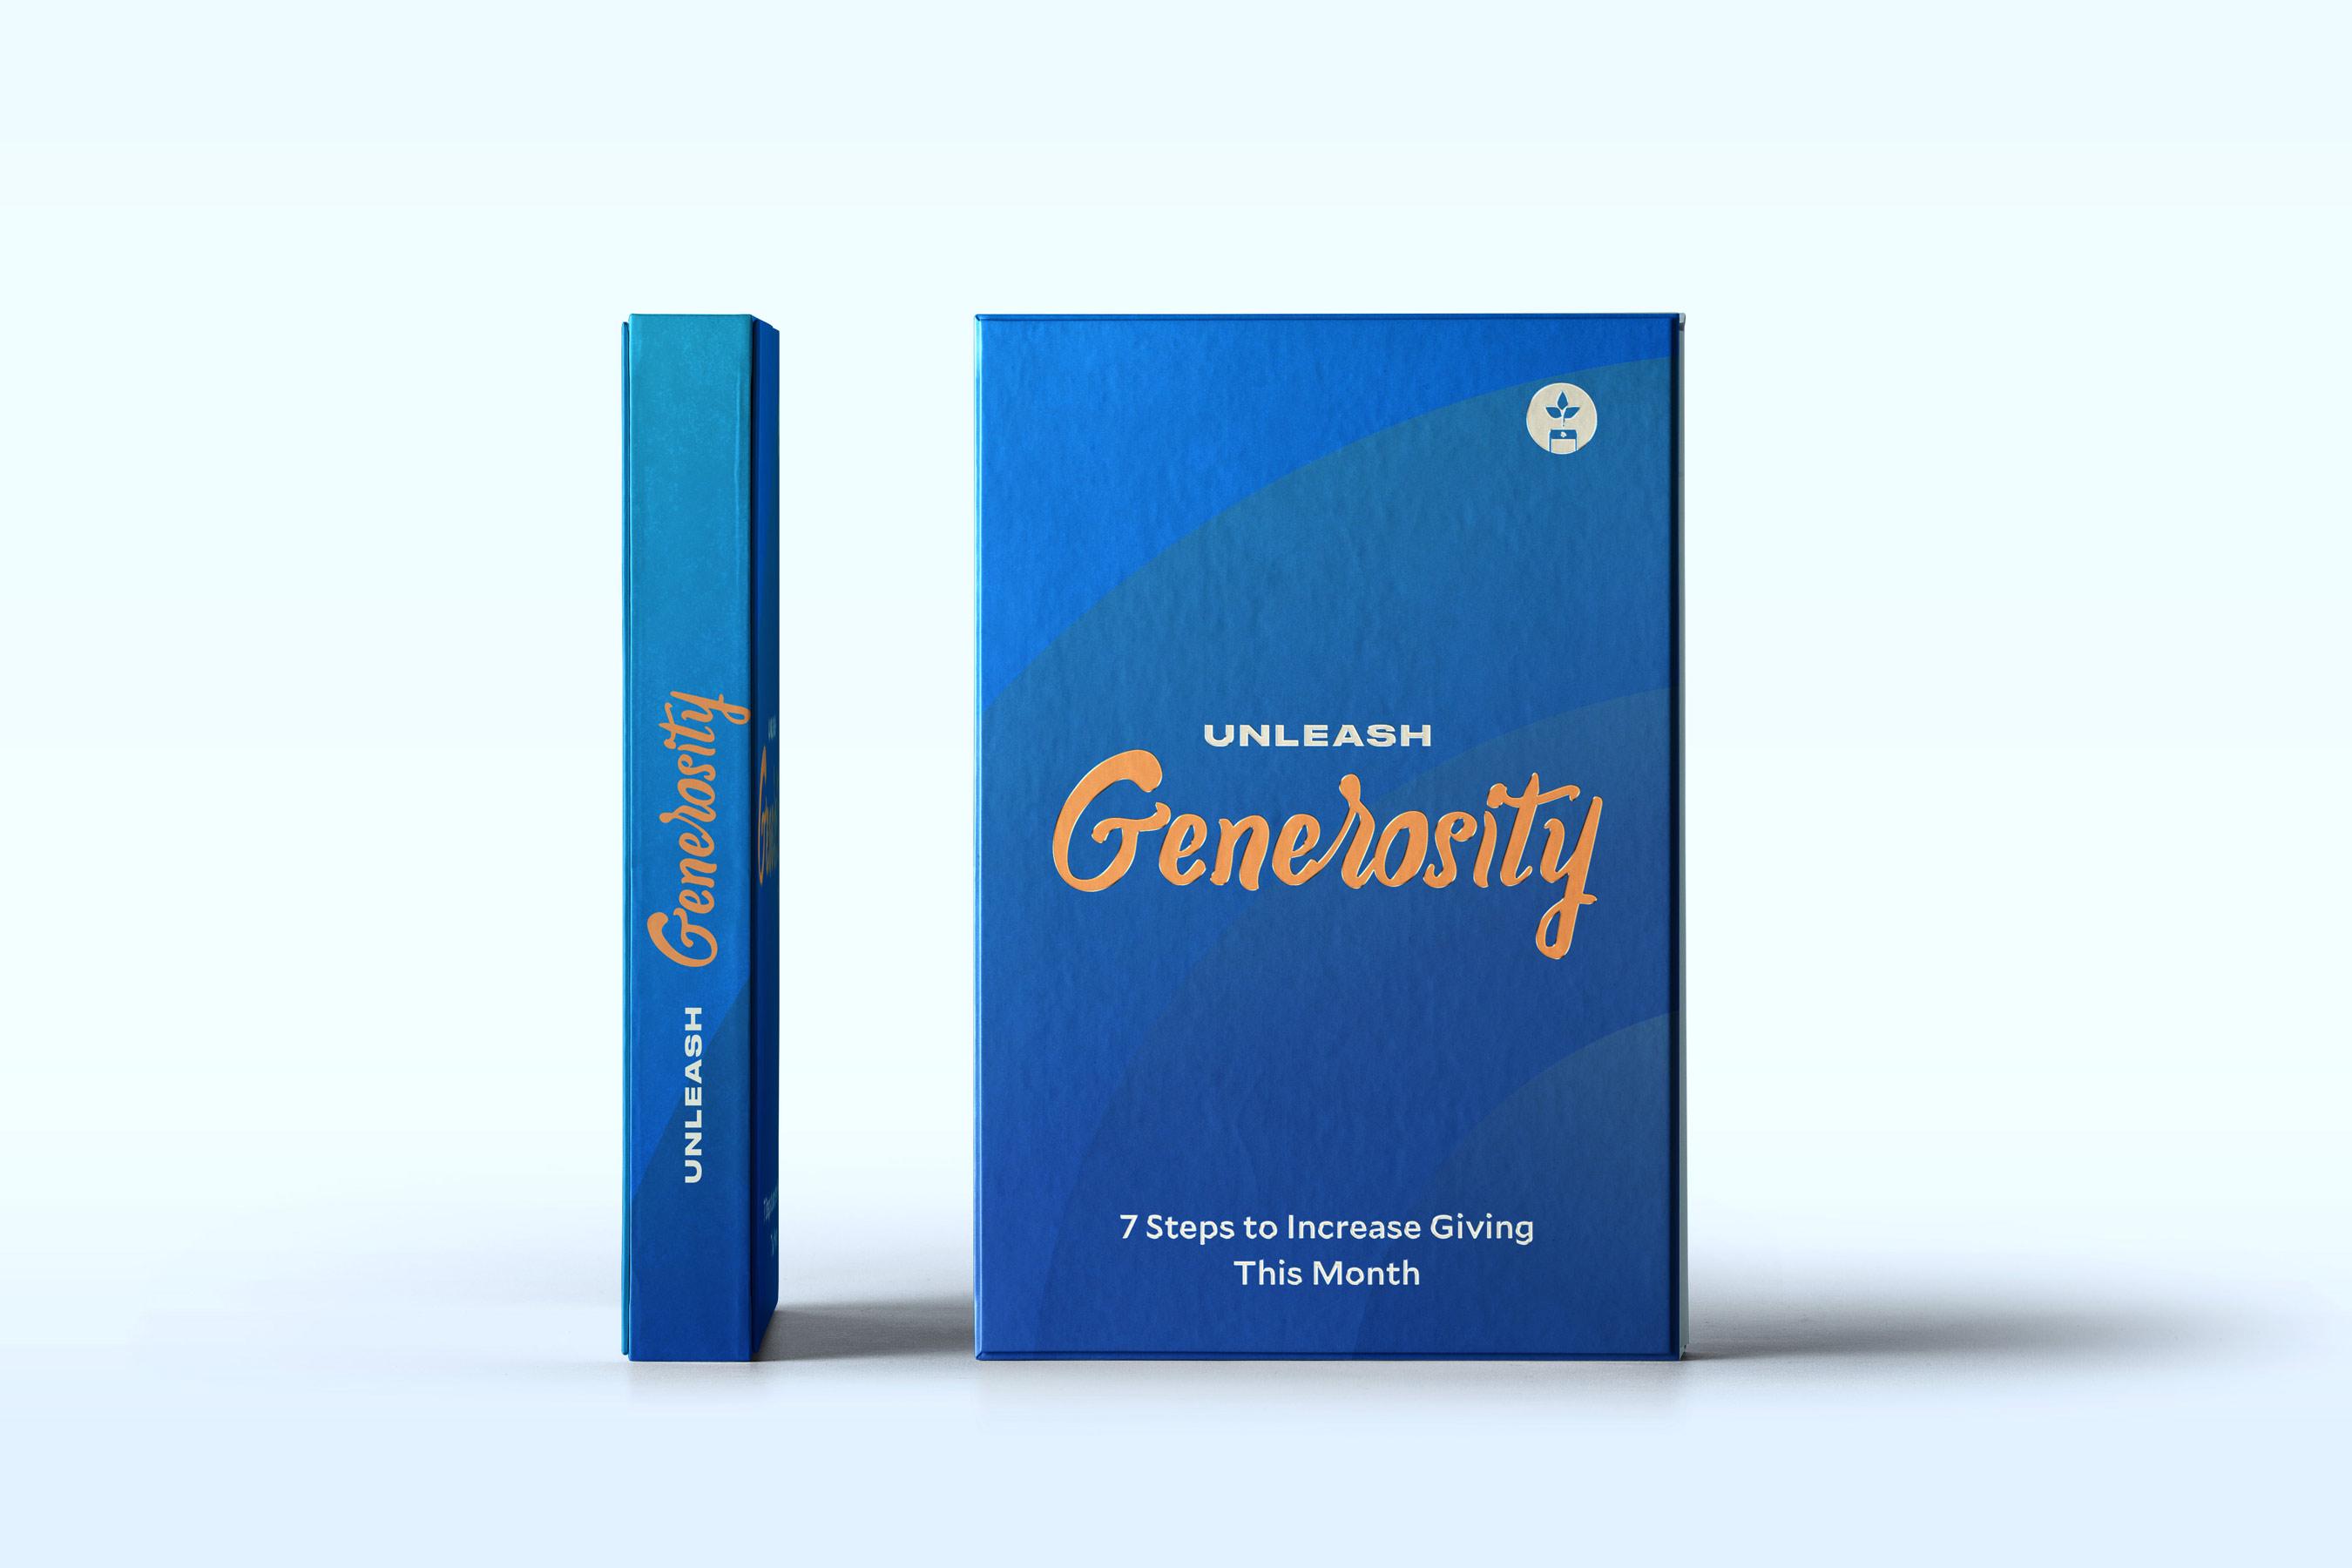 Unleash generosity